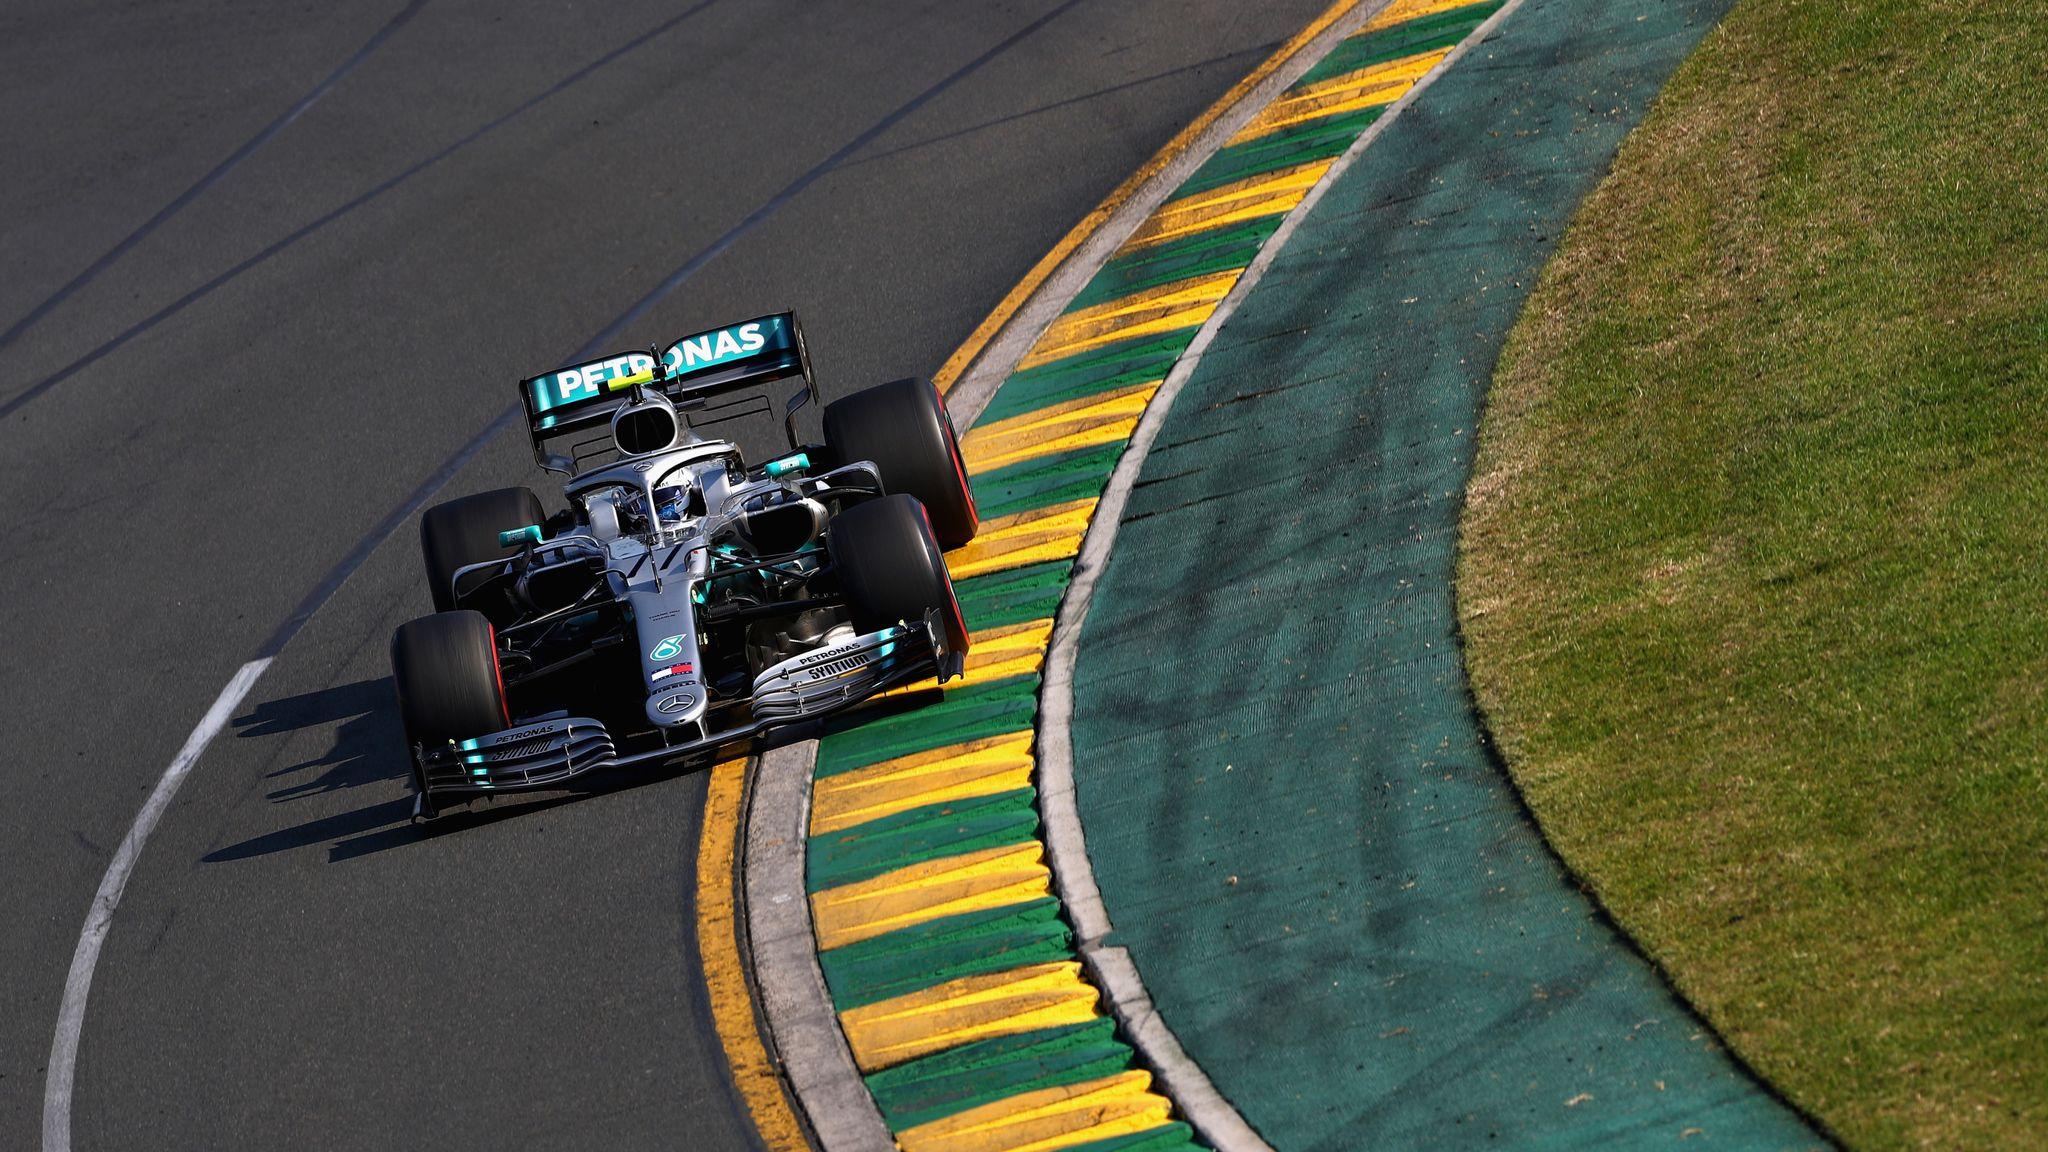 Australian GP: Valtteri Bottas beats Lewis Hamilton, Ferrari struggle